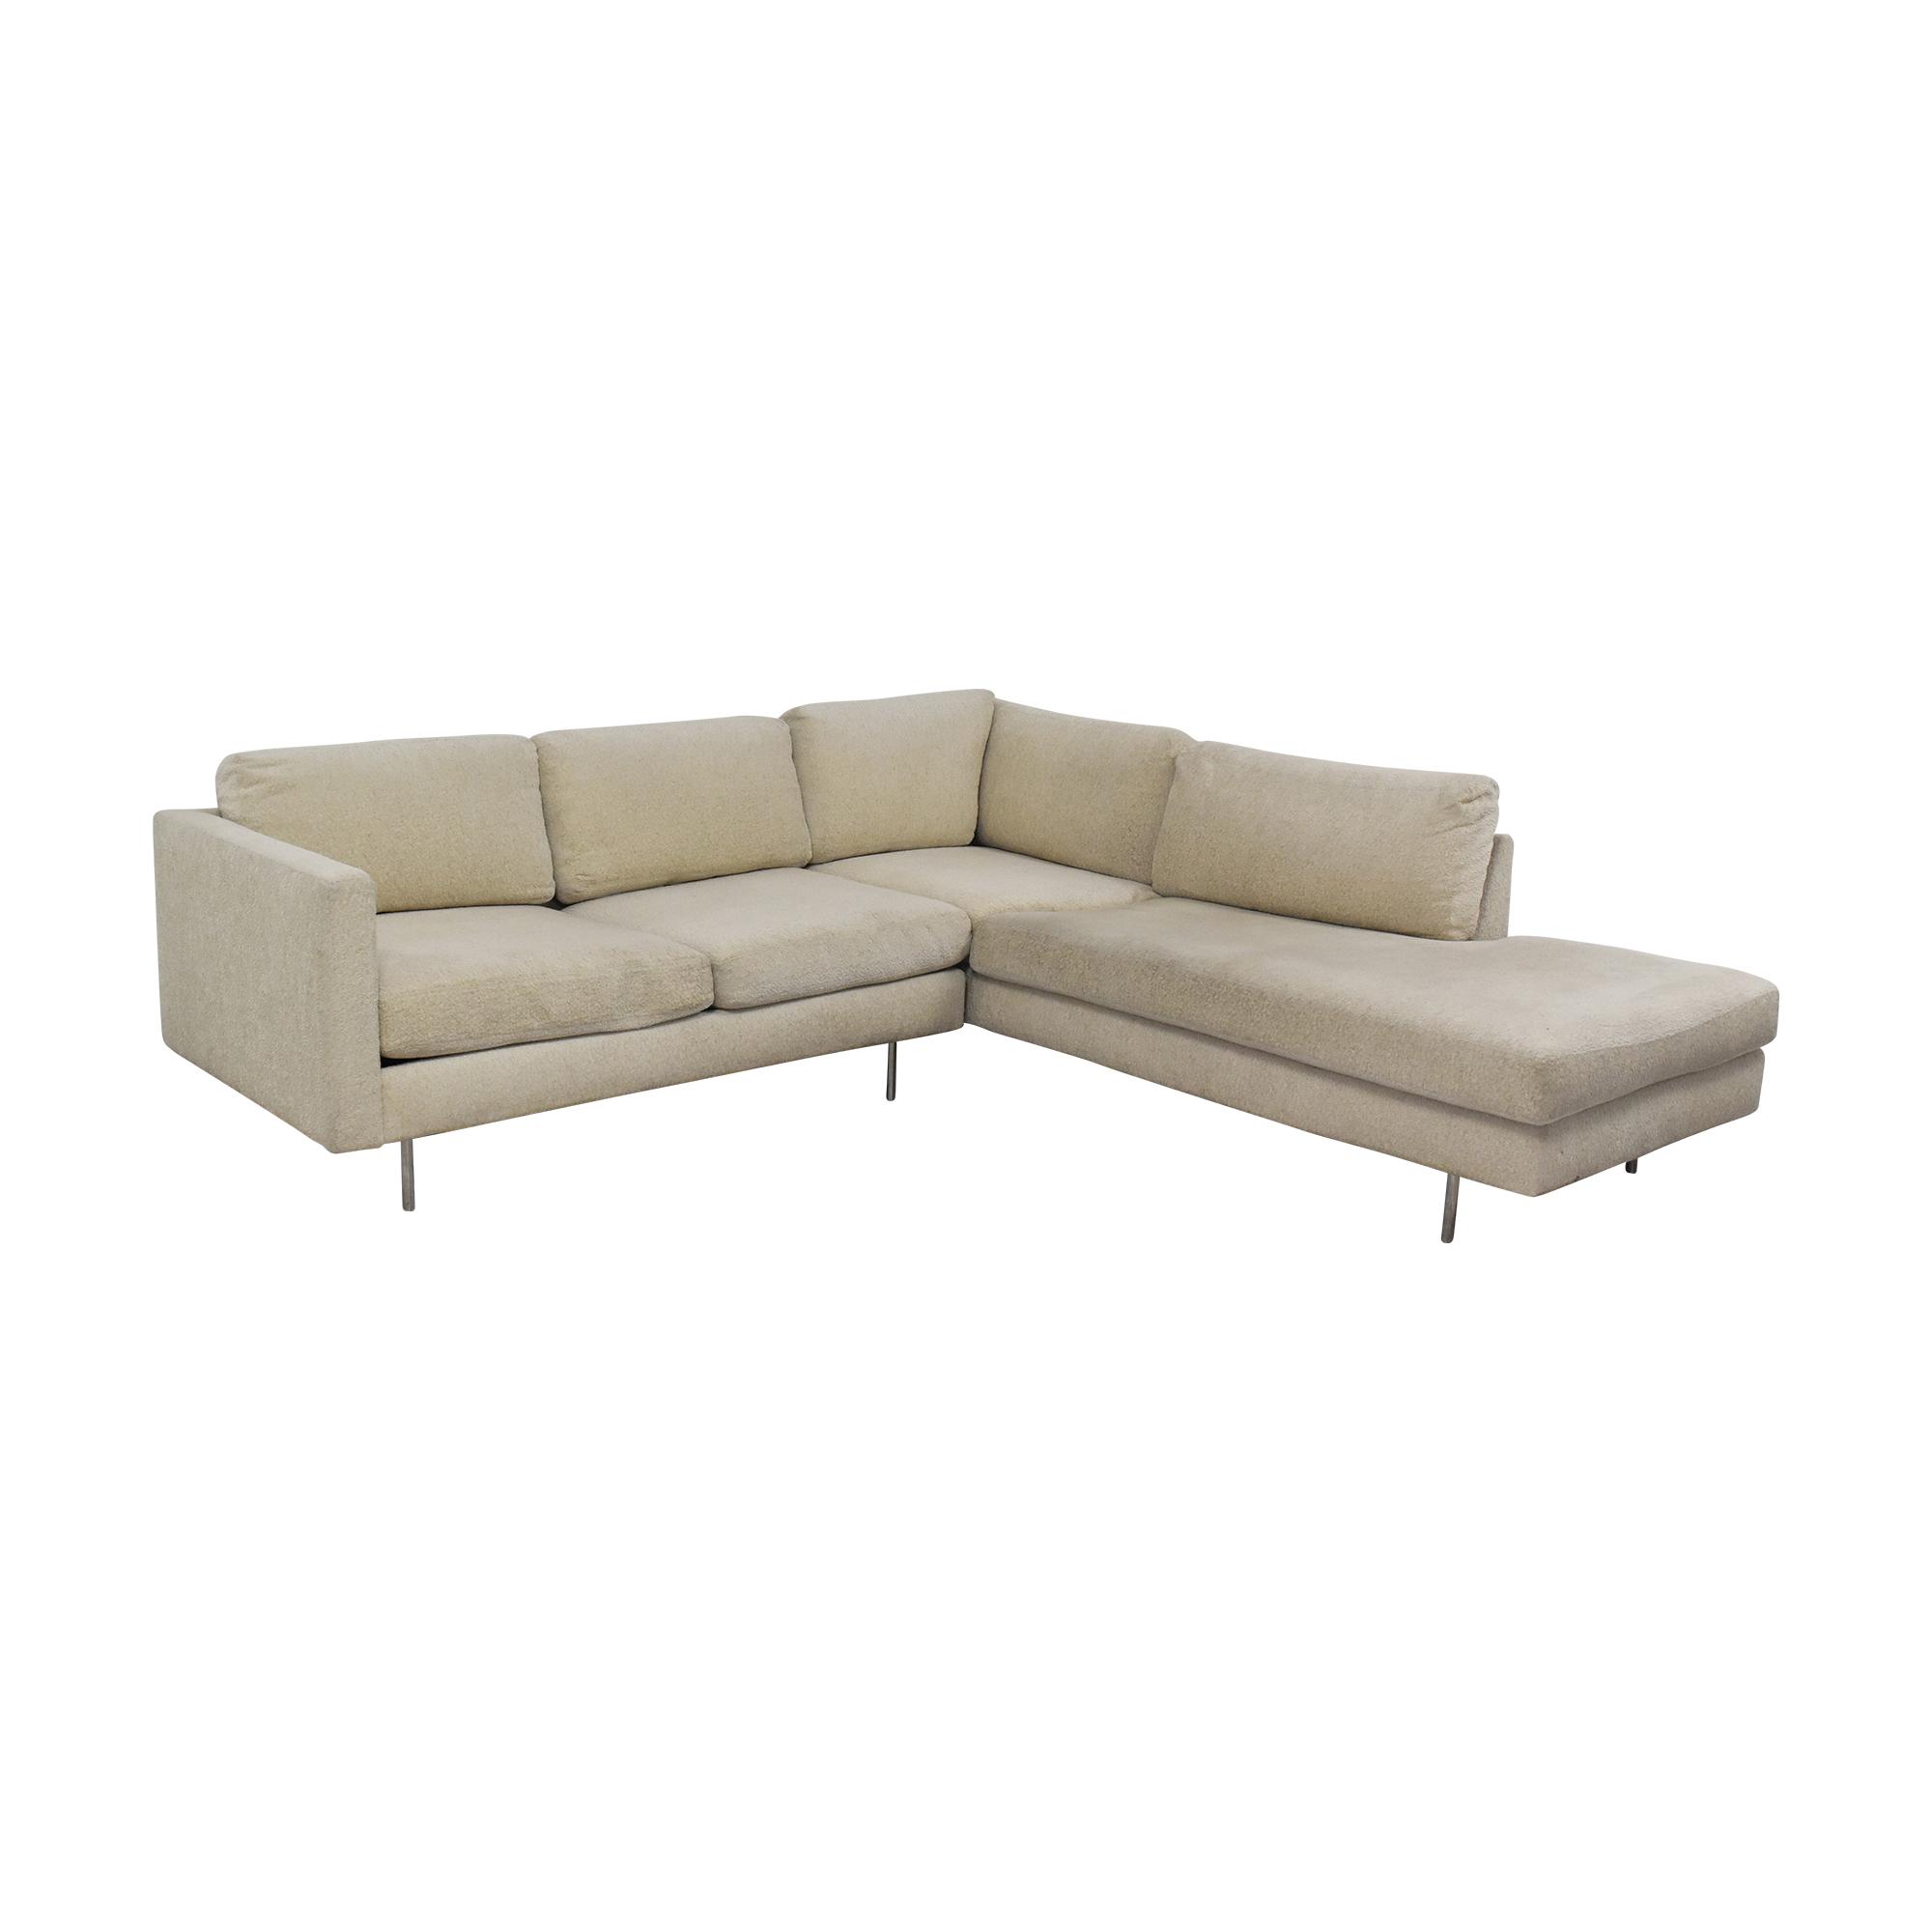 buy Thayer Coggin Milo Baughman Design Classic Sectional Sofa Thayer Coggin Sofas